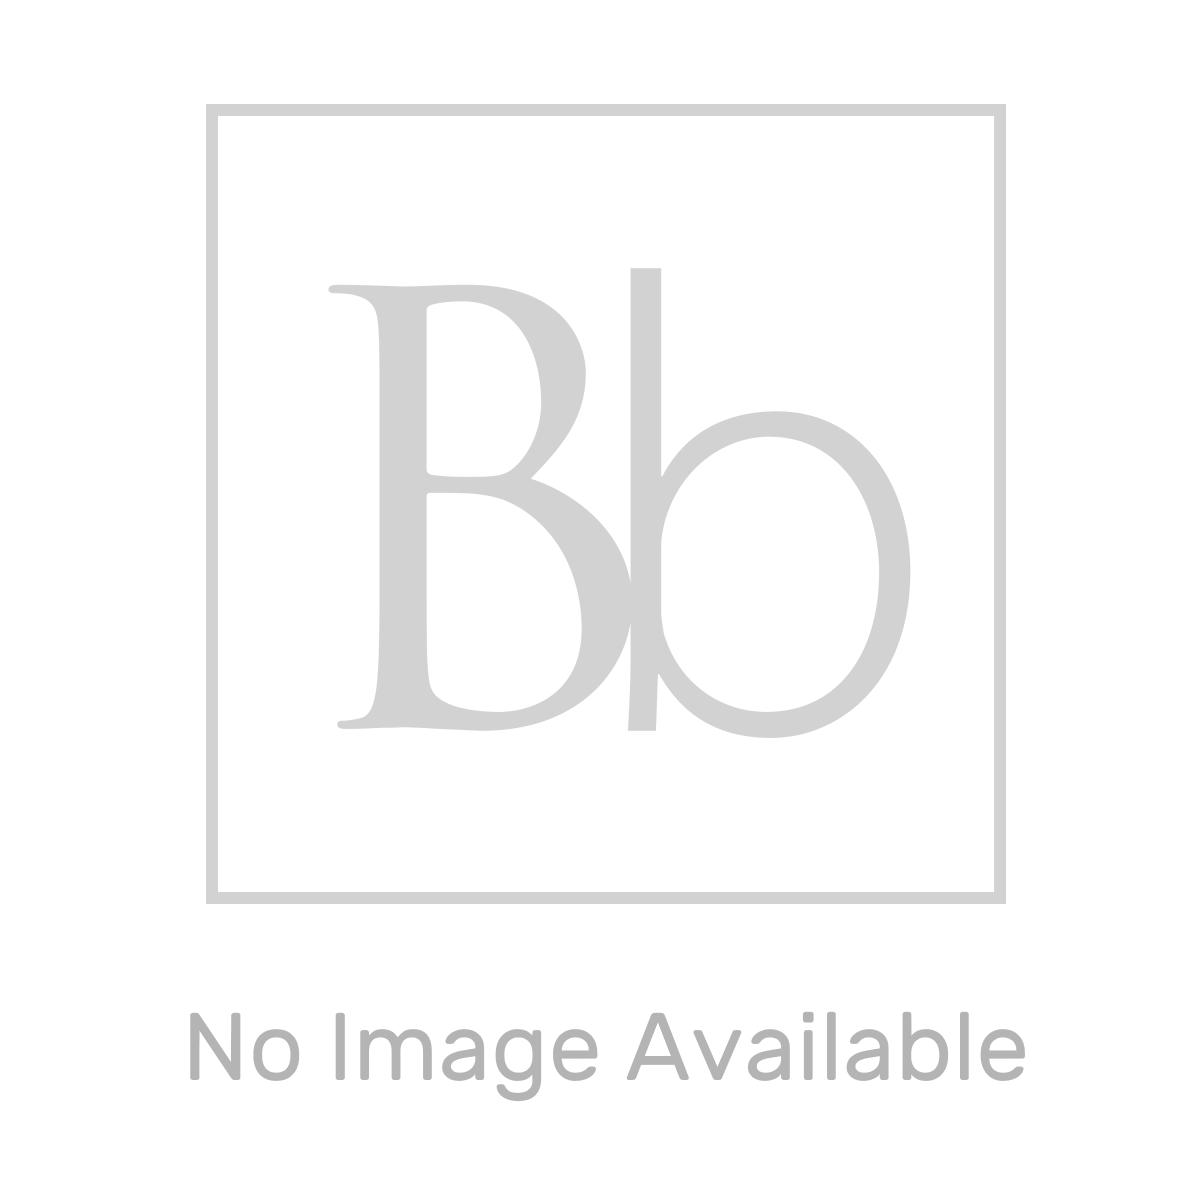 RAK Surface Charcoal Lappato Tile 600 x 600mm Lifestyle